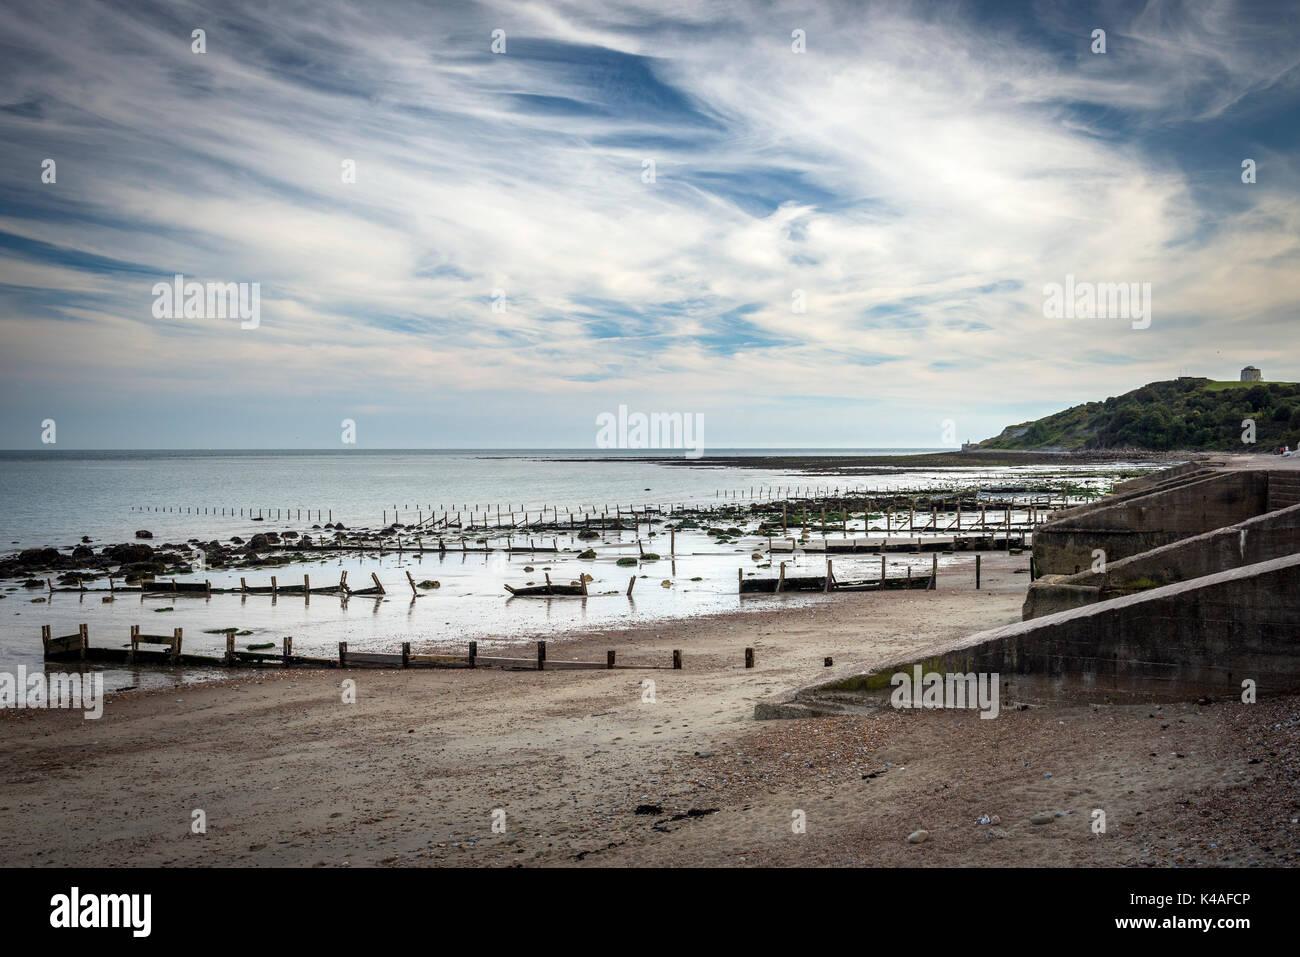 Warren Bay near Folkestone, Kent, UK - Stock Image